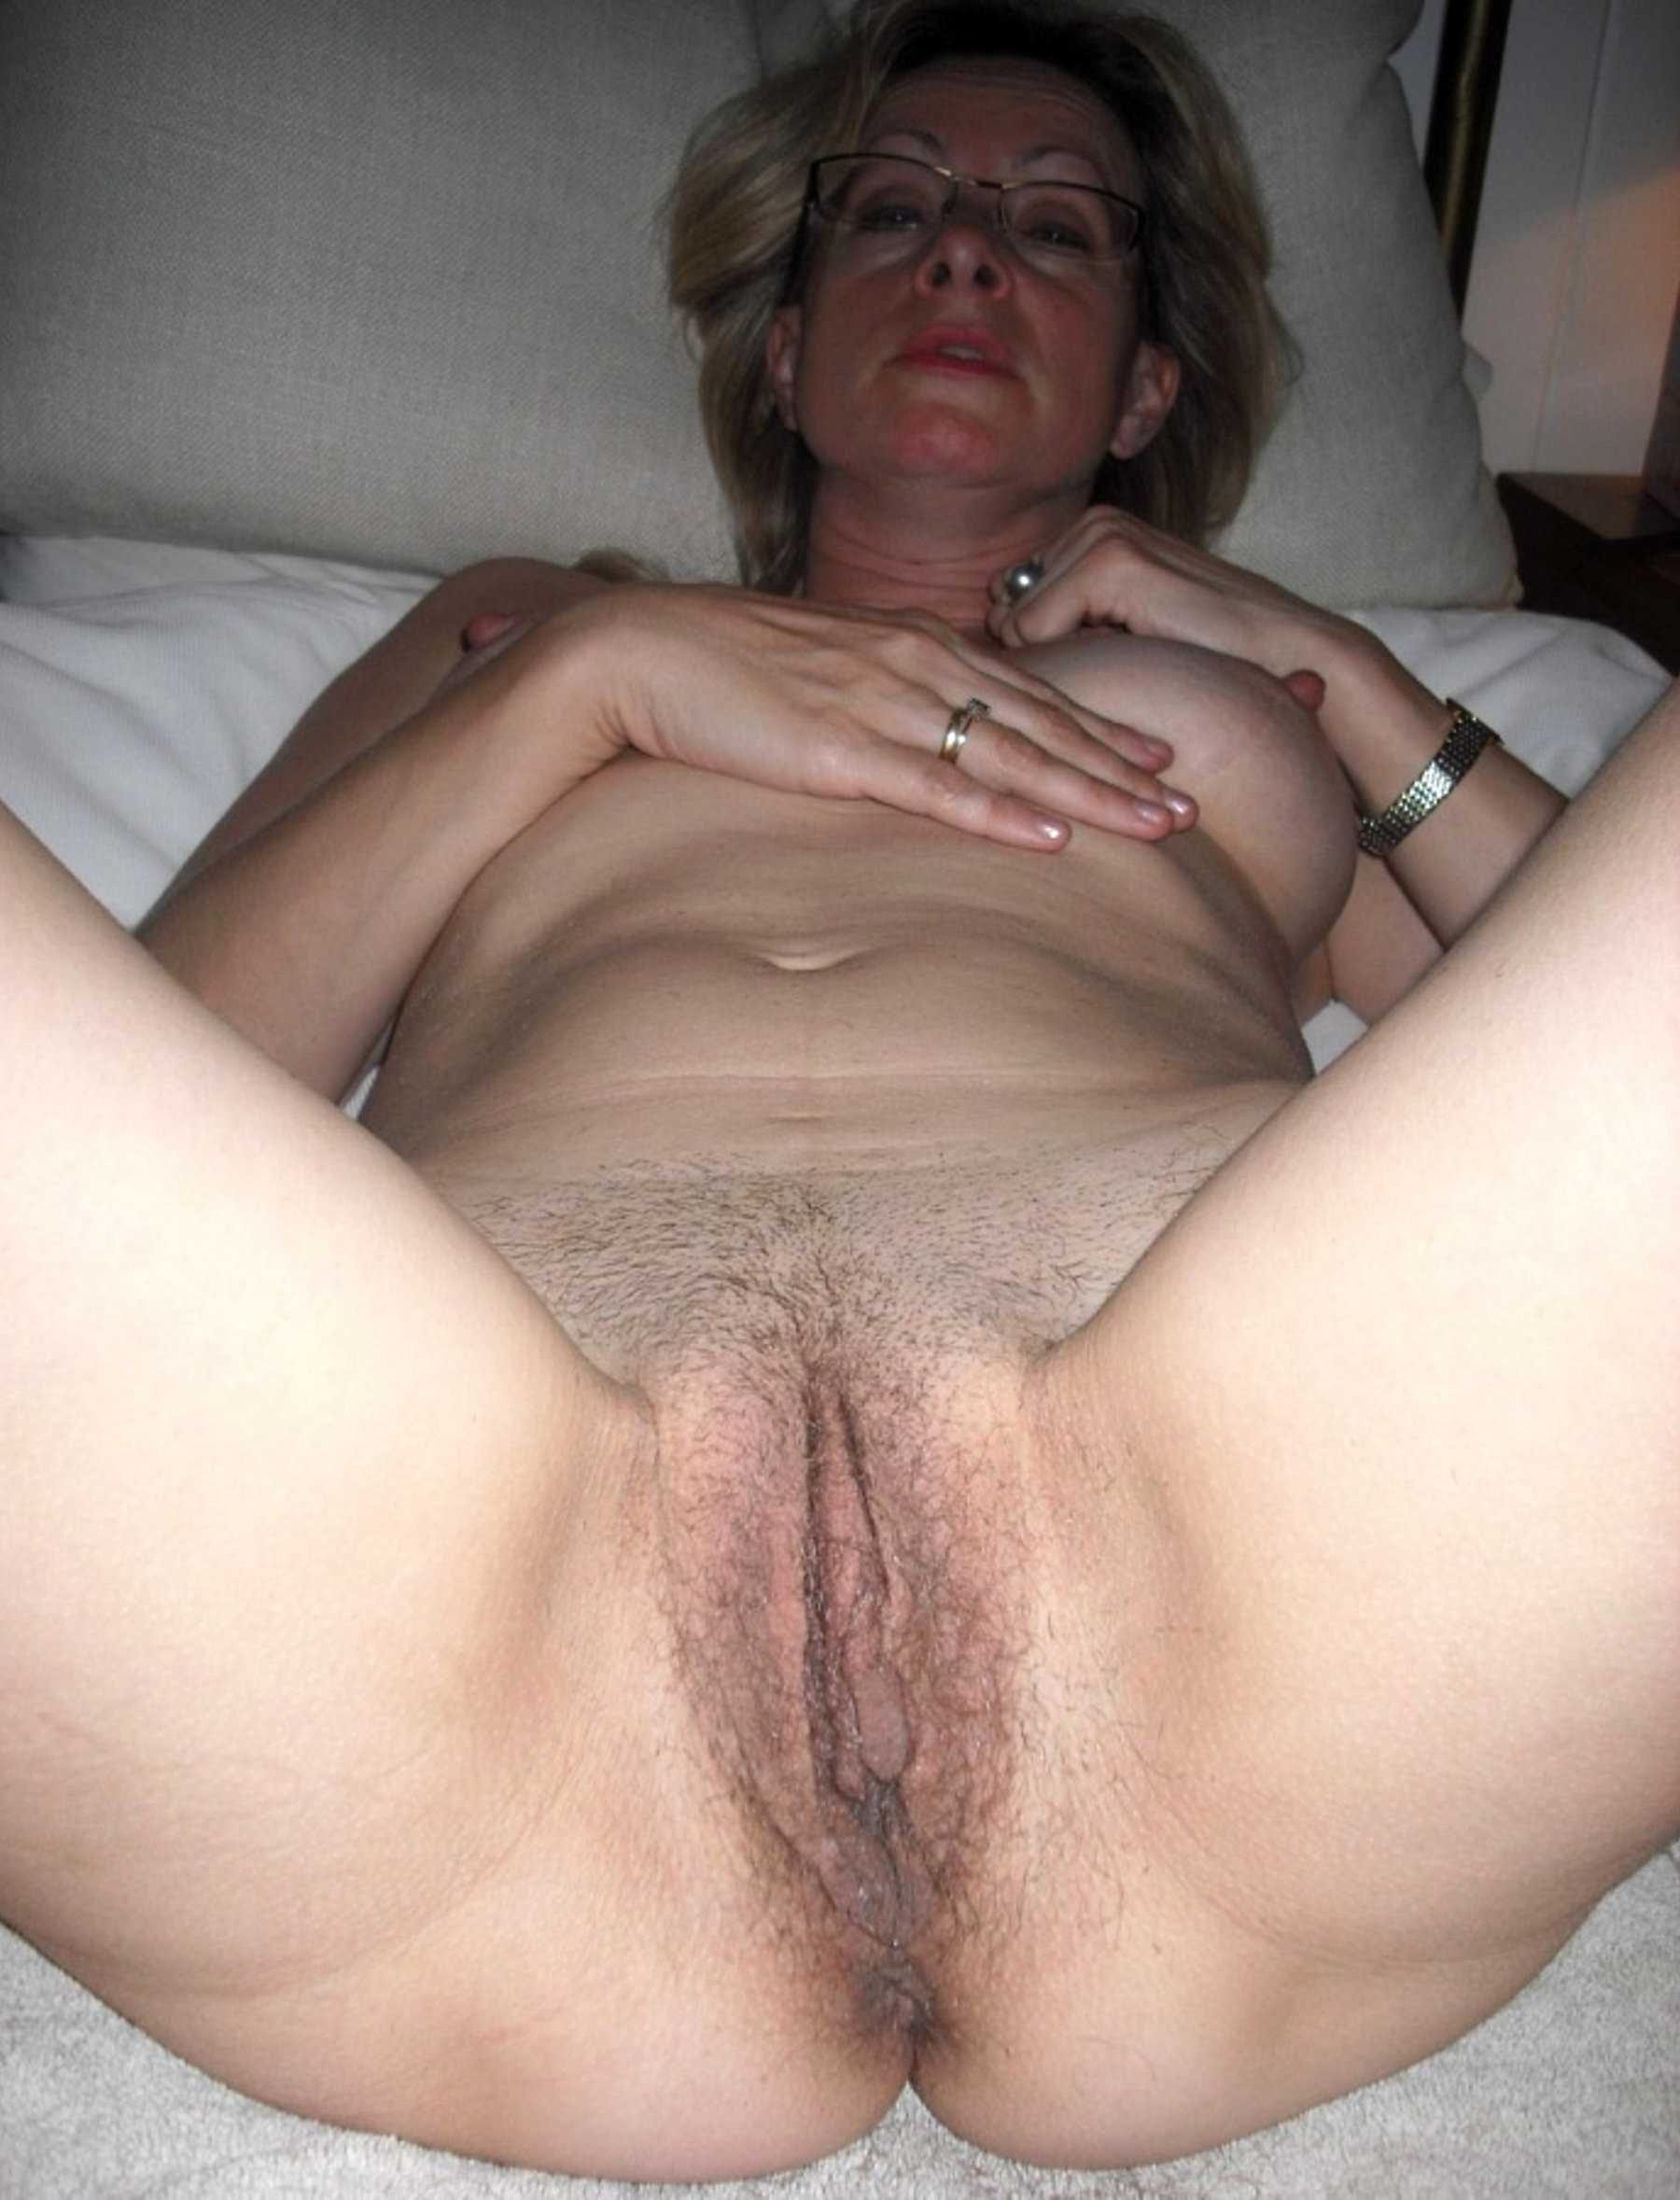 Floppy Tits Hairy Pussy